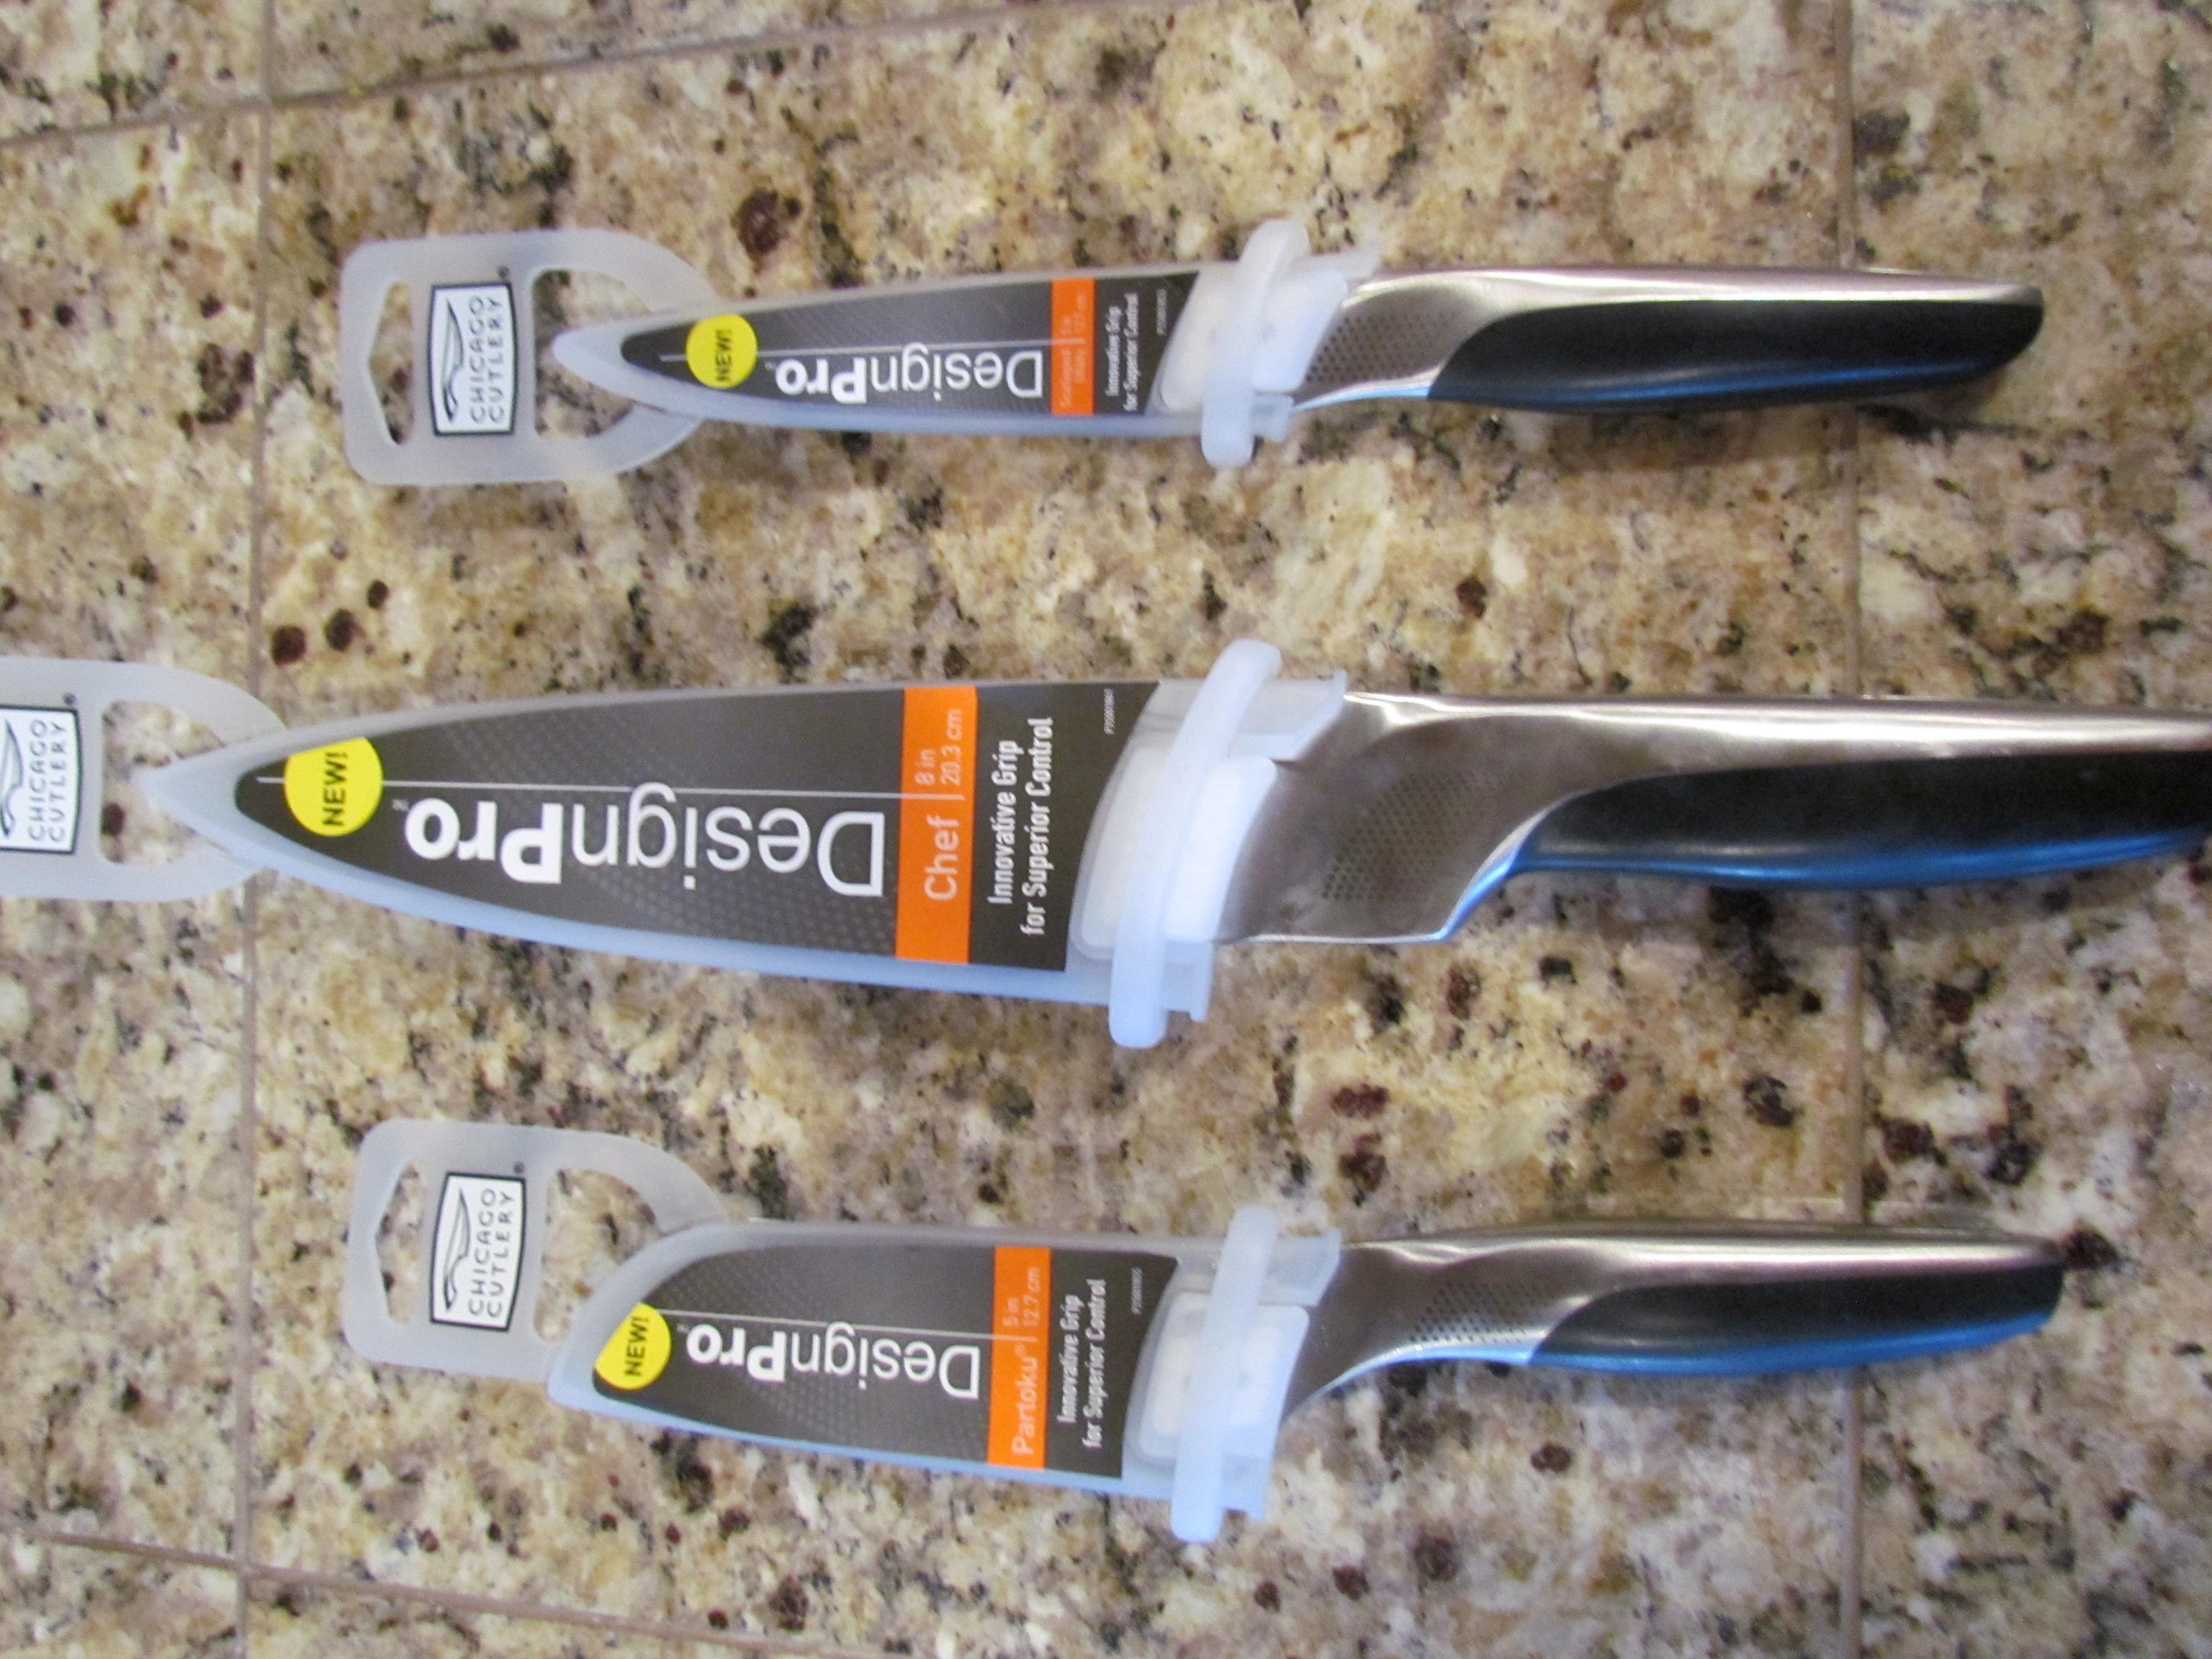 Vintage cutco cutlery 1023 serrated carving knife brown handle - Filename Chicago Cutlery Knives 2 Jpg